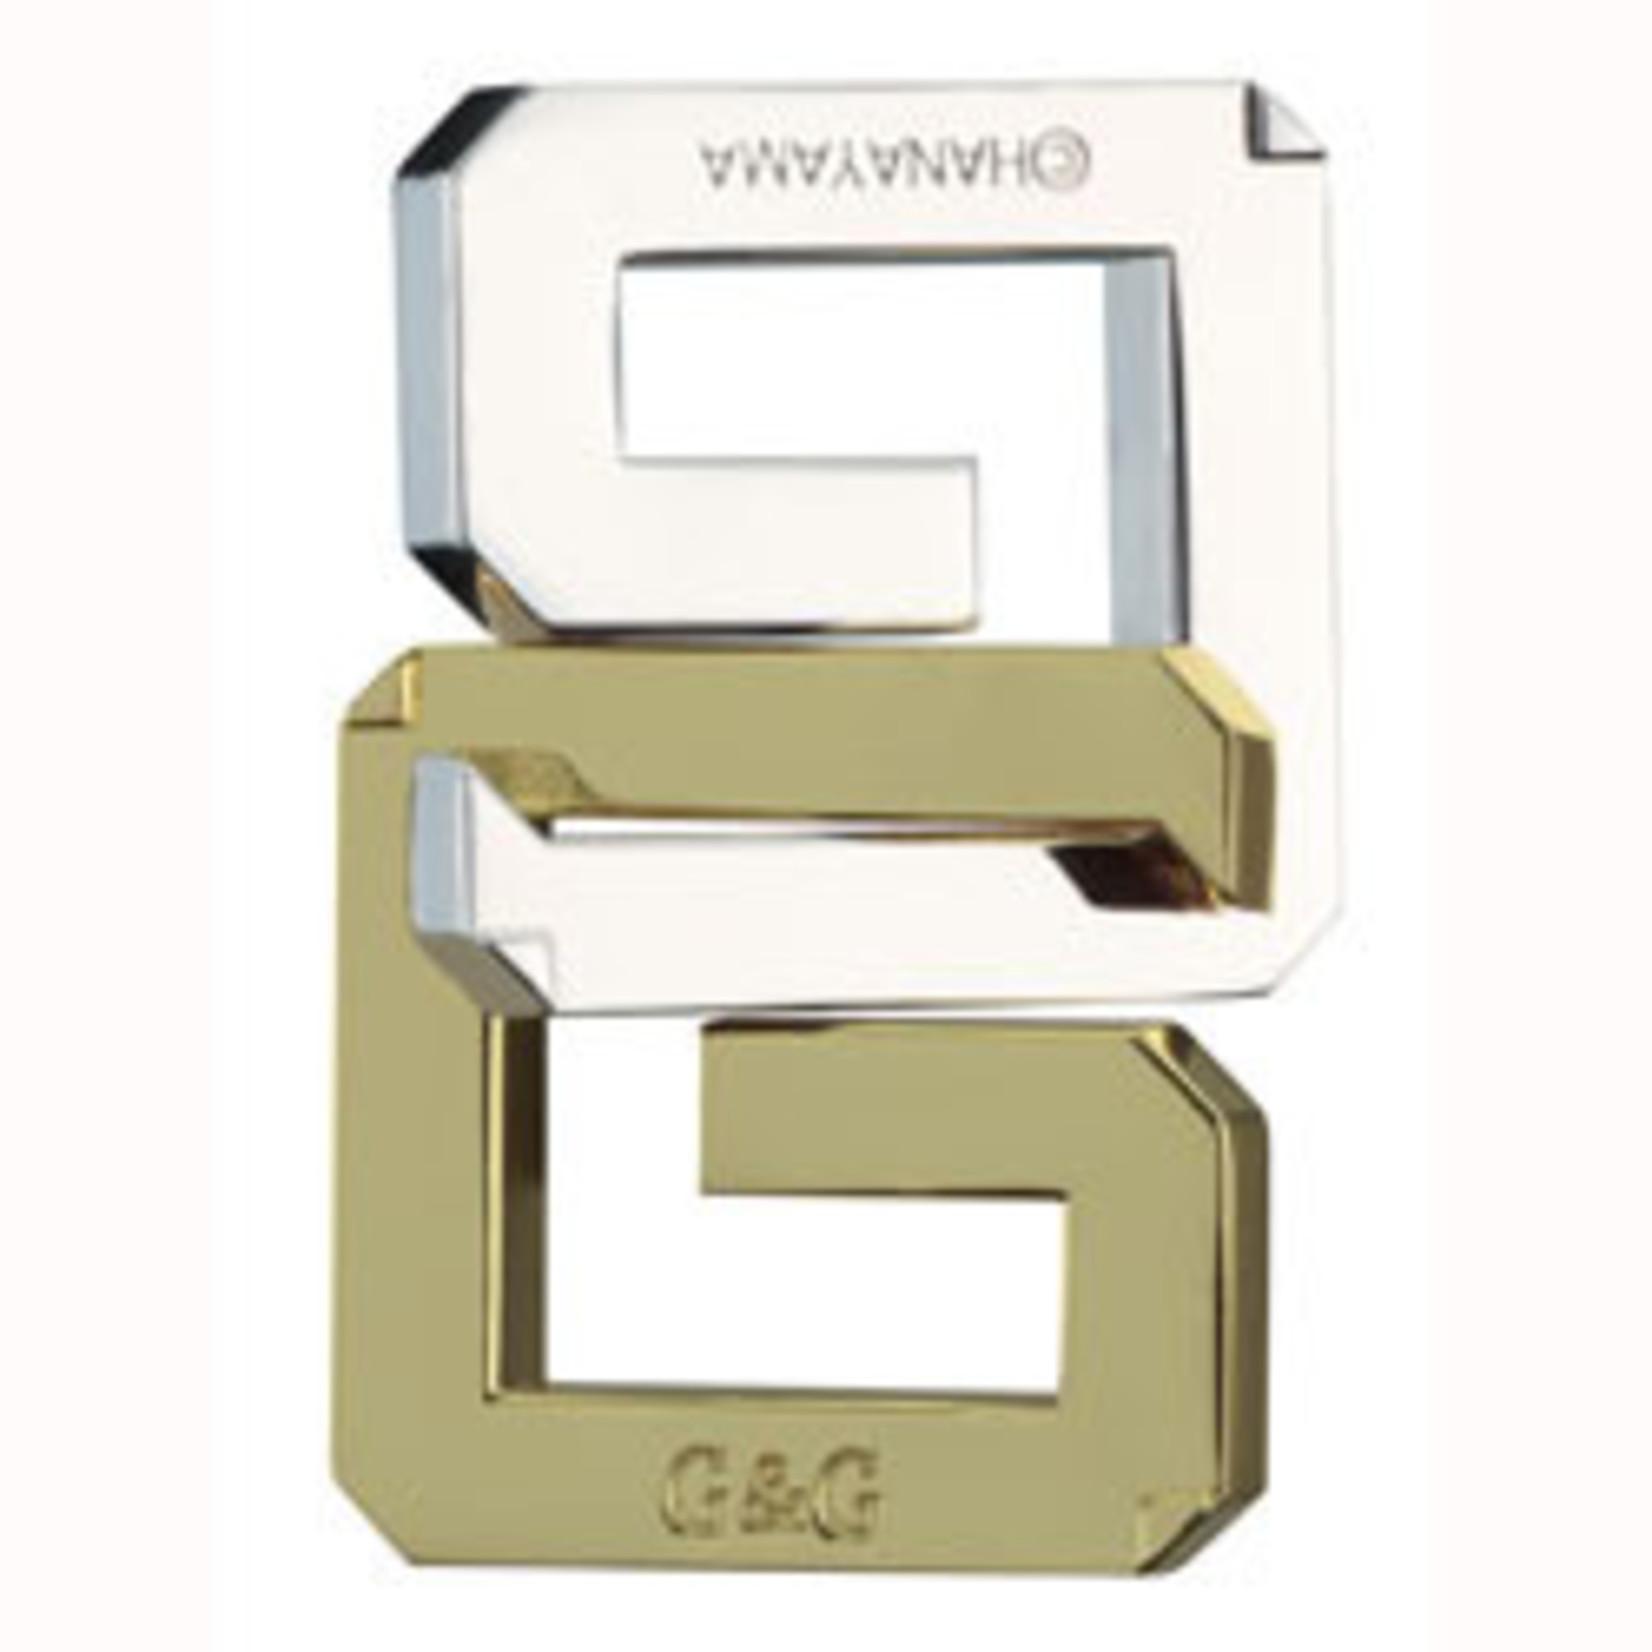 Eureka Cast puzzel G and G***